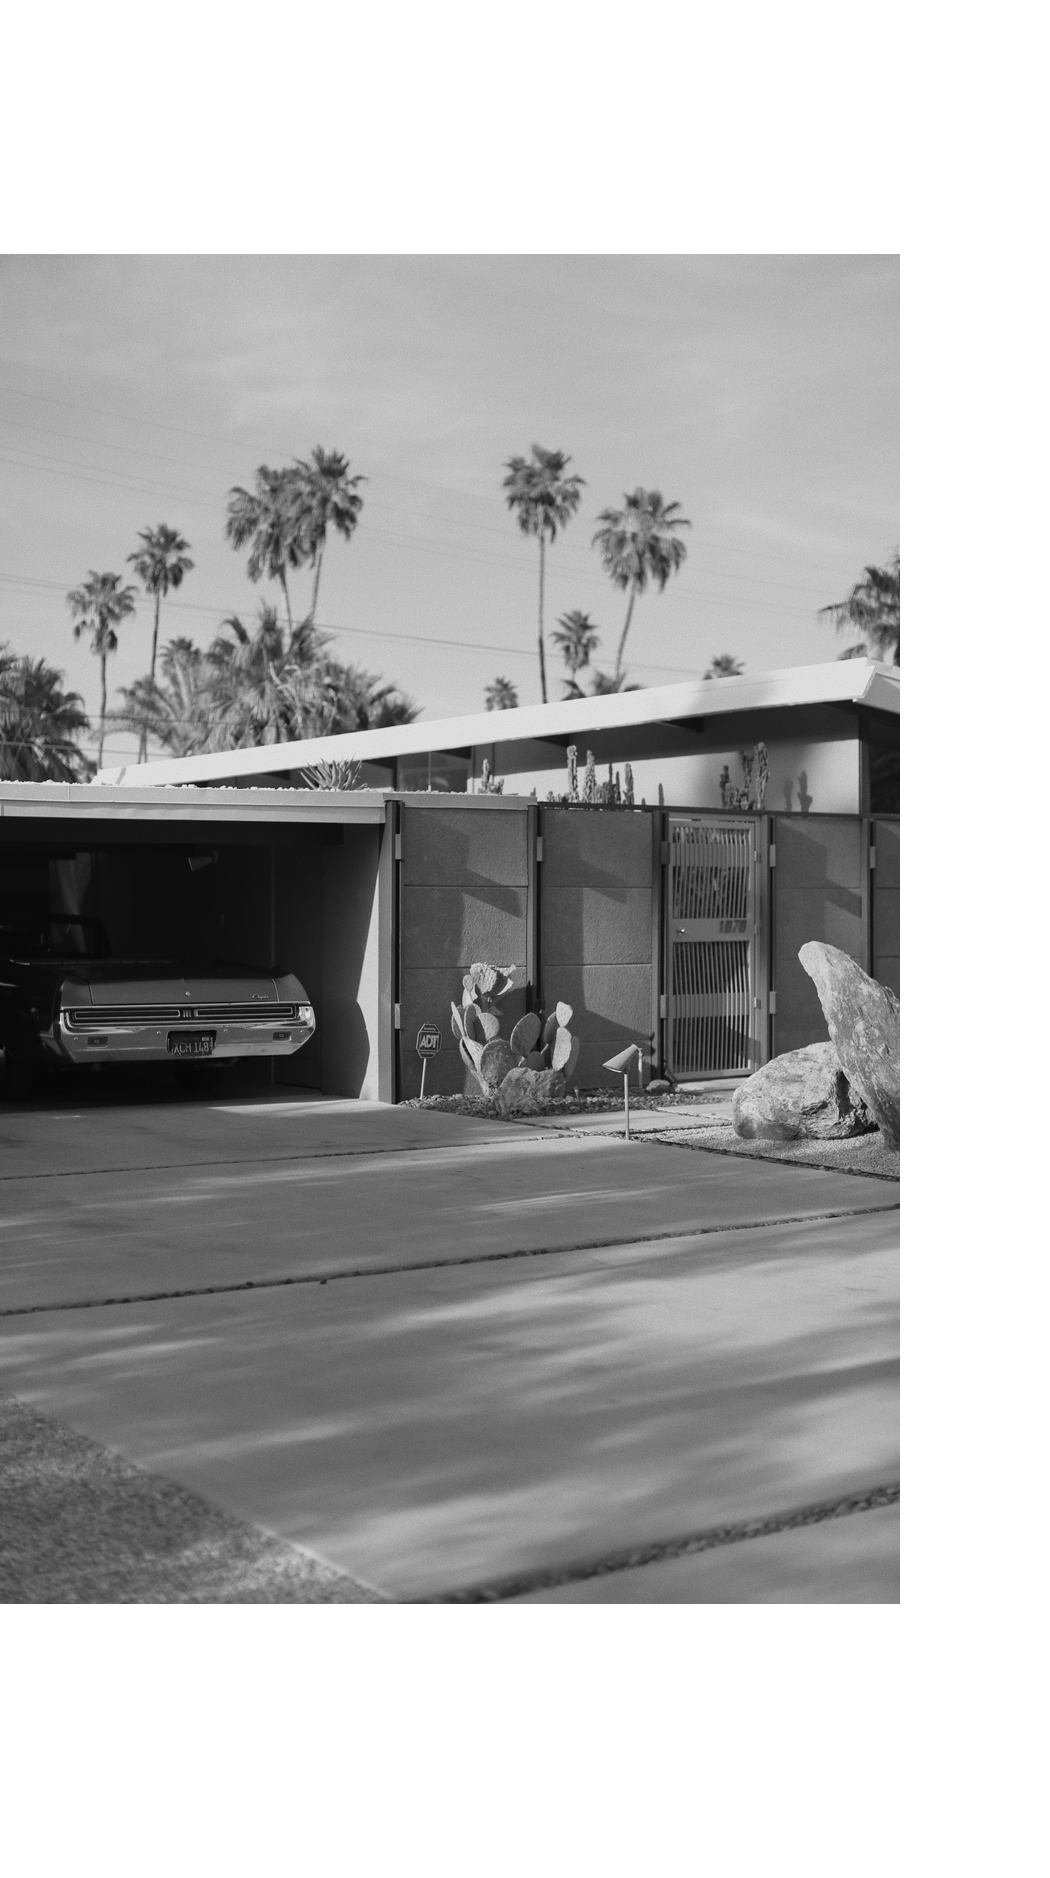 Palm Springs - Classic Car & Mid-Century House - Fiona Dinkelbach